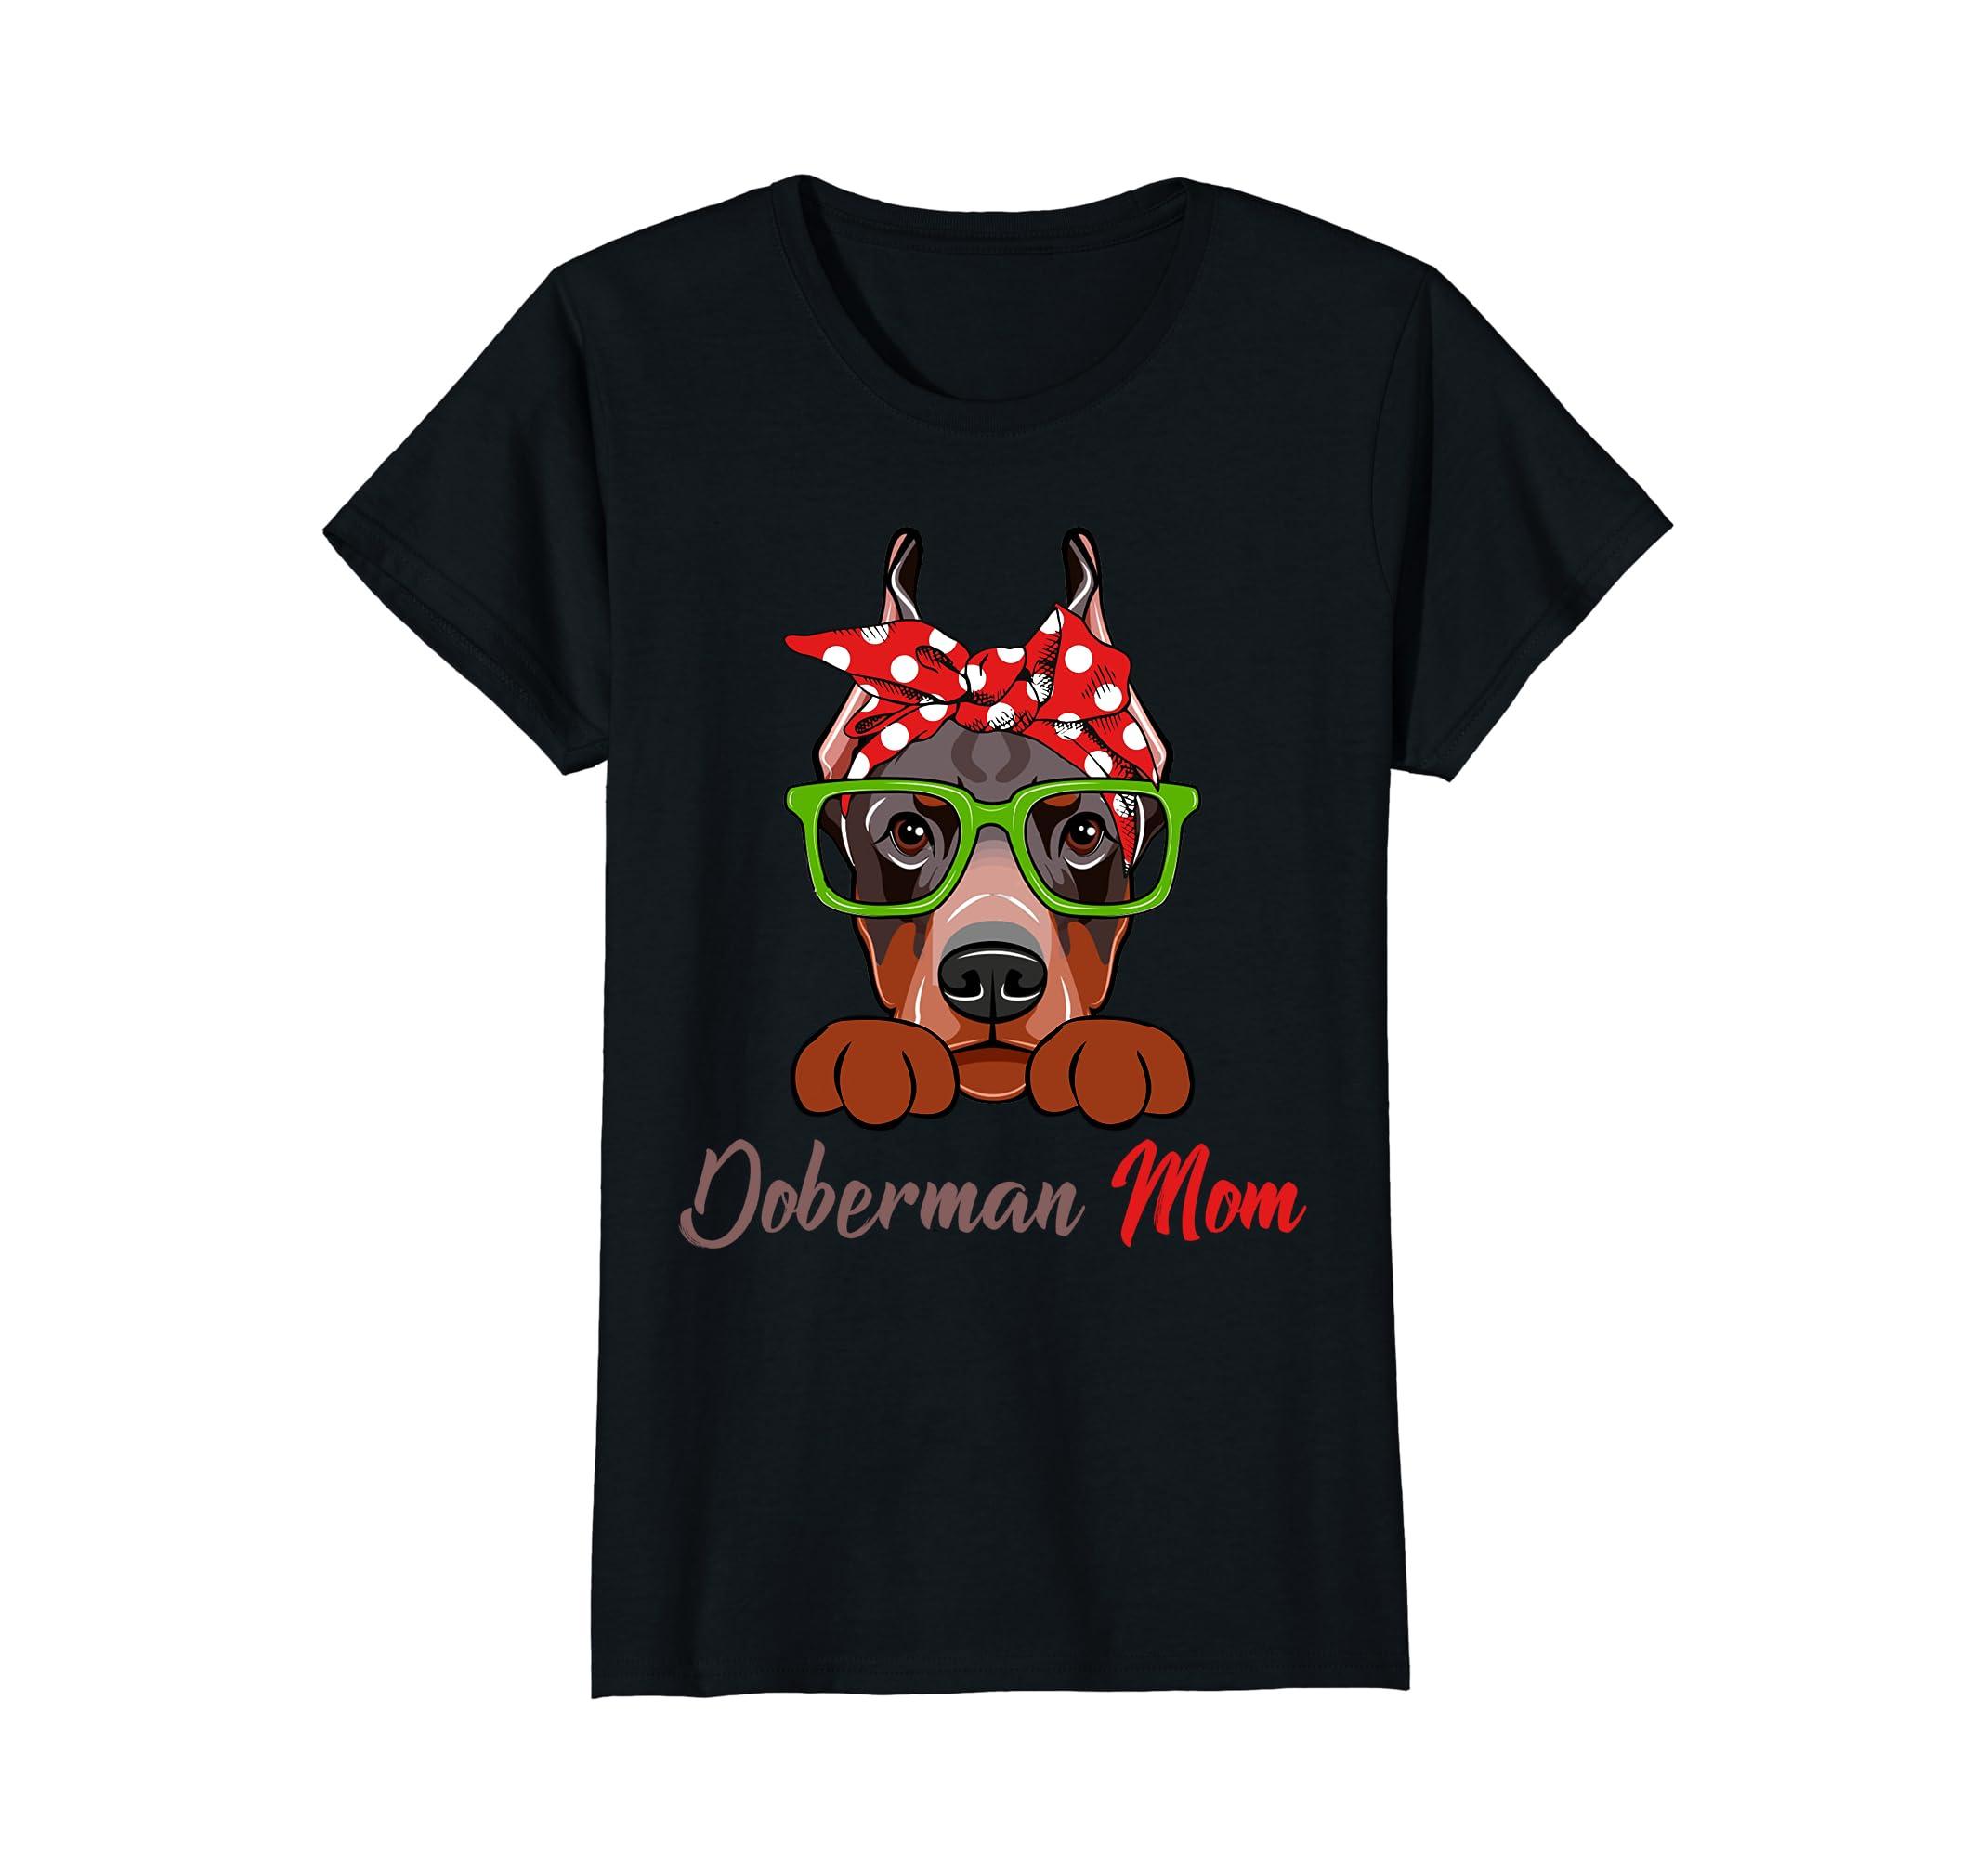 Doberman Mom Dog Lover Funny T-Shirt Mother's Day Gift-Newstyleth